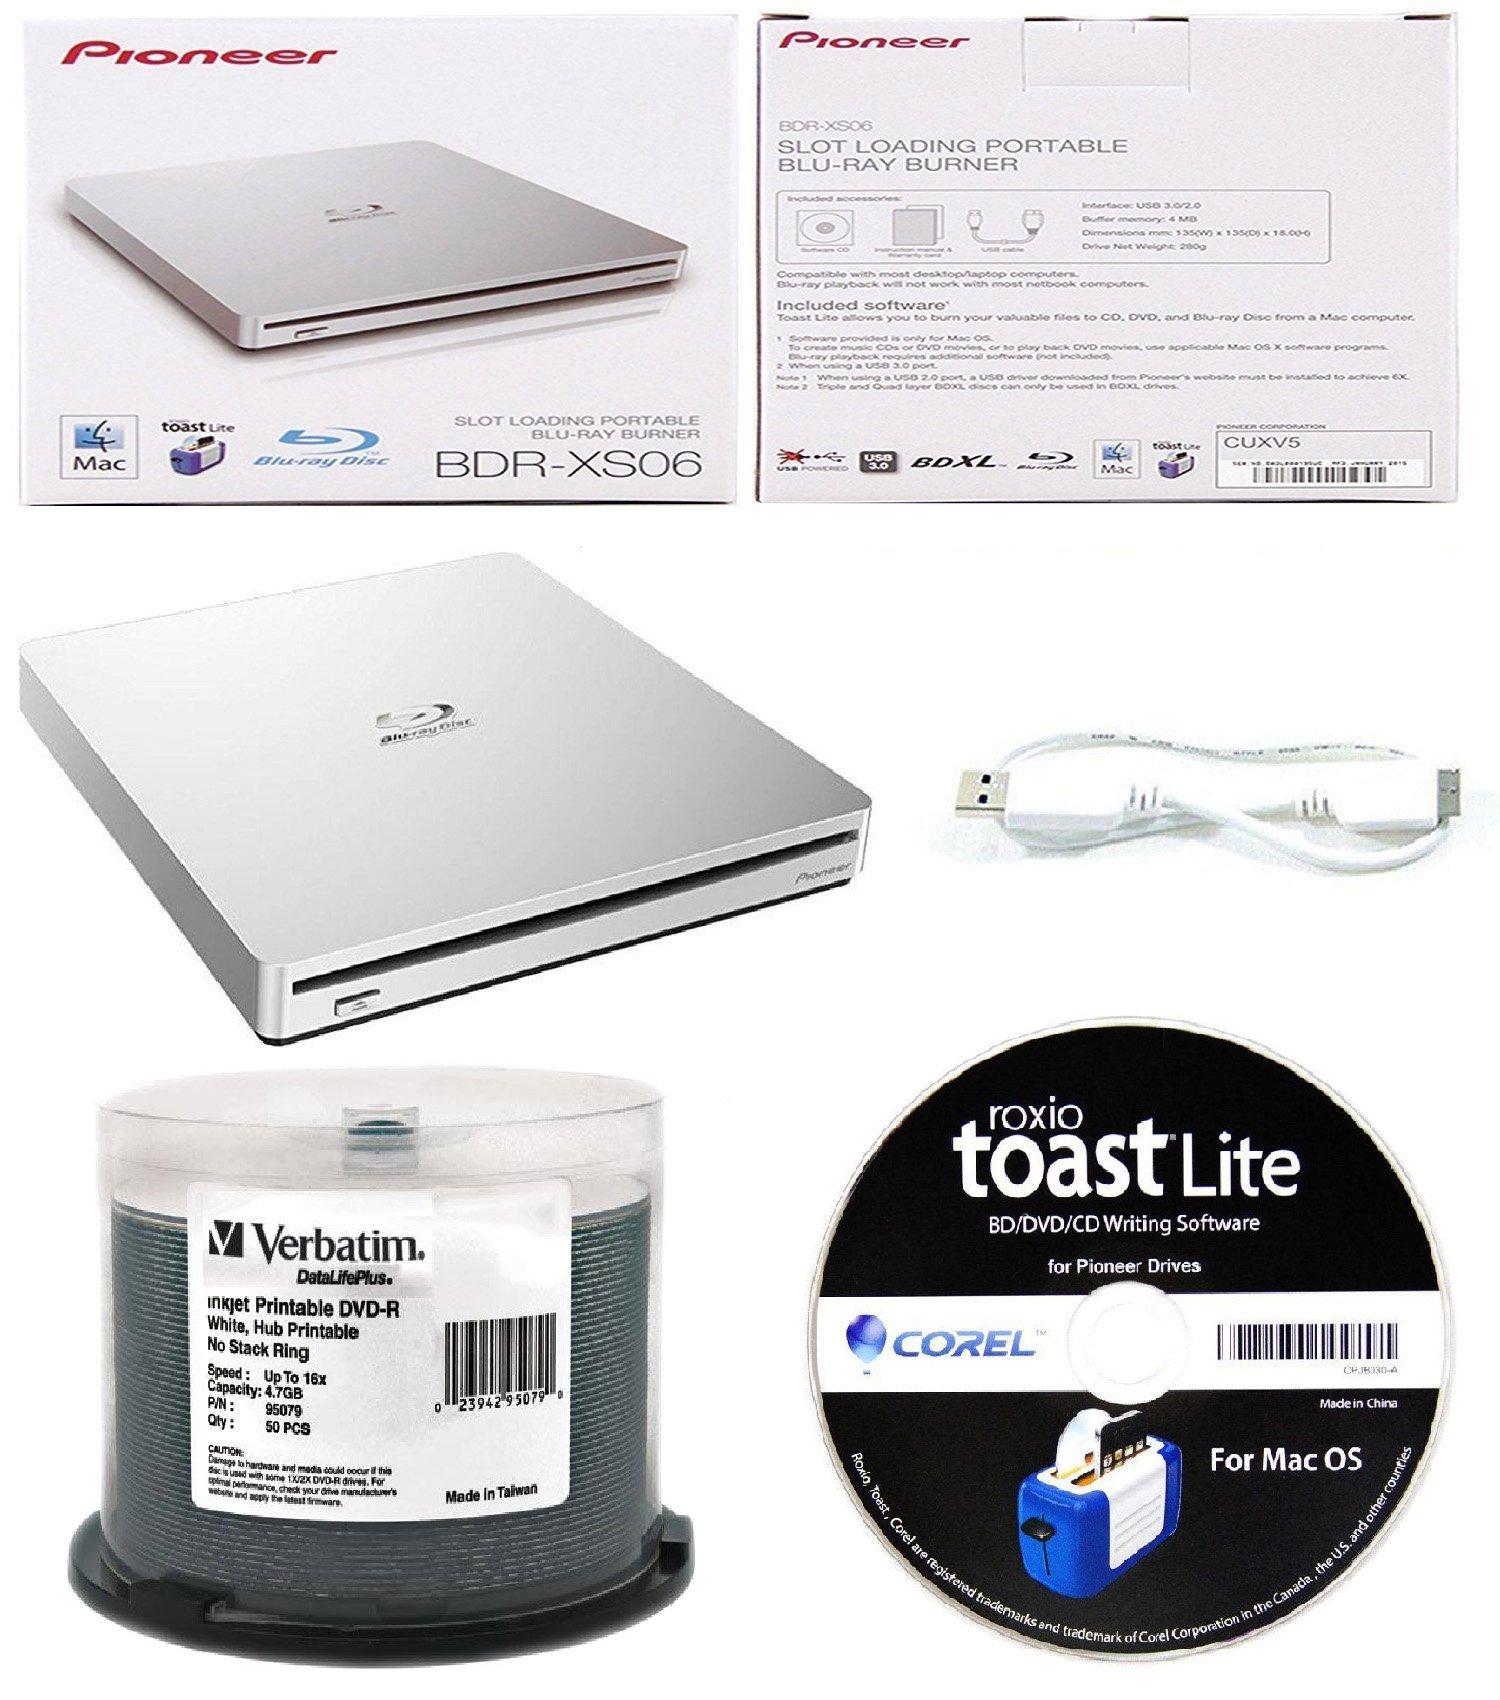 Pioneer 6x BDR-XS06 Slim Slot Portable External Blu-ray BDXL Burner, Roxio Toast Lite Software and USB Cable Bundle with 50pk DVD-R Verbatim 4.7GB 16X DataLifePlus White Inkjet, Hub Printable